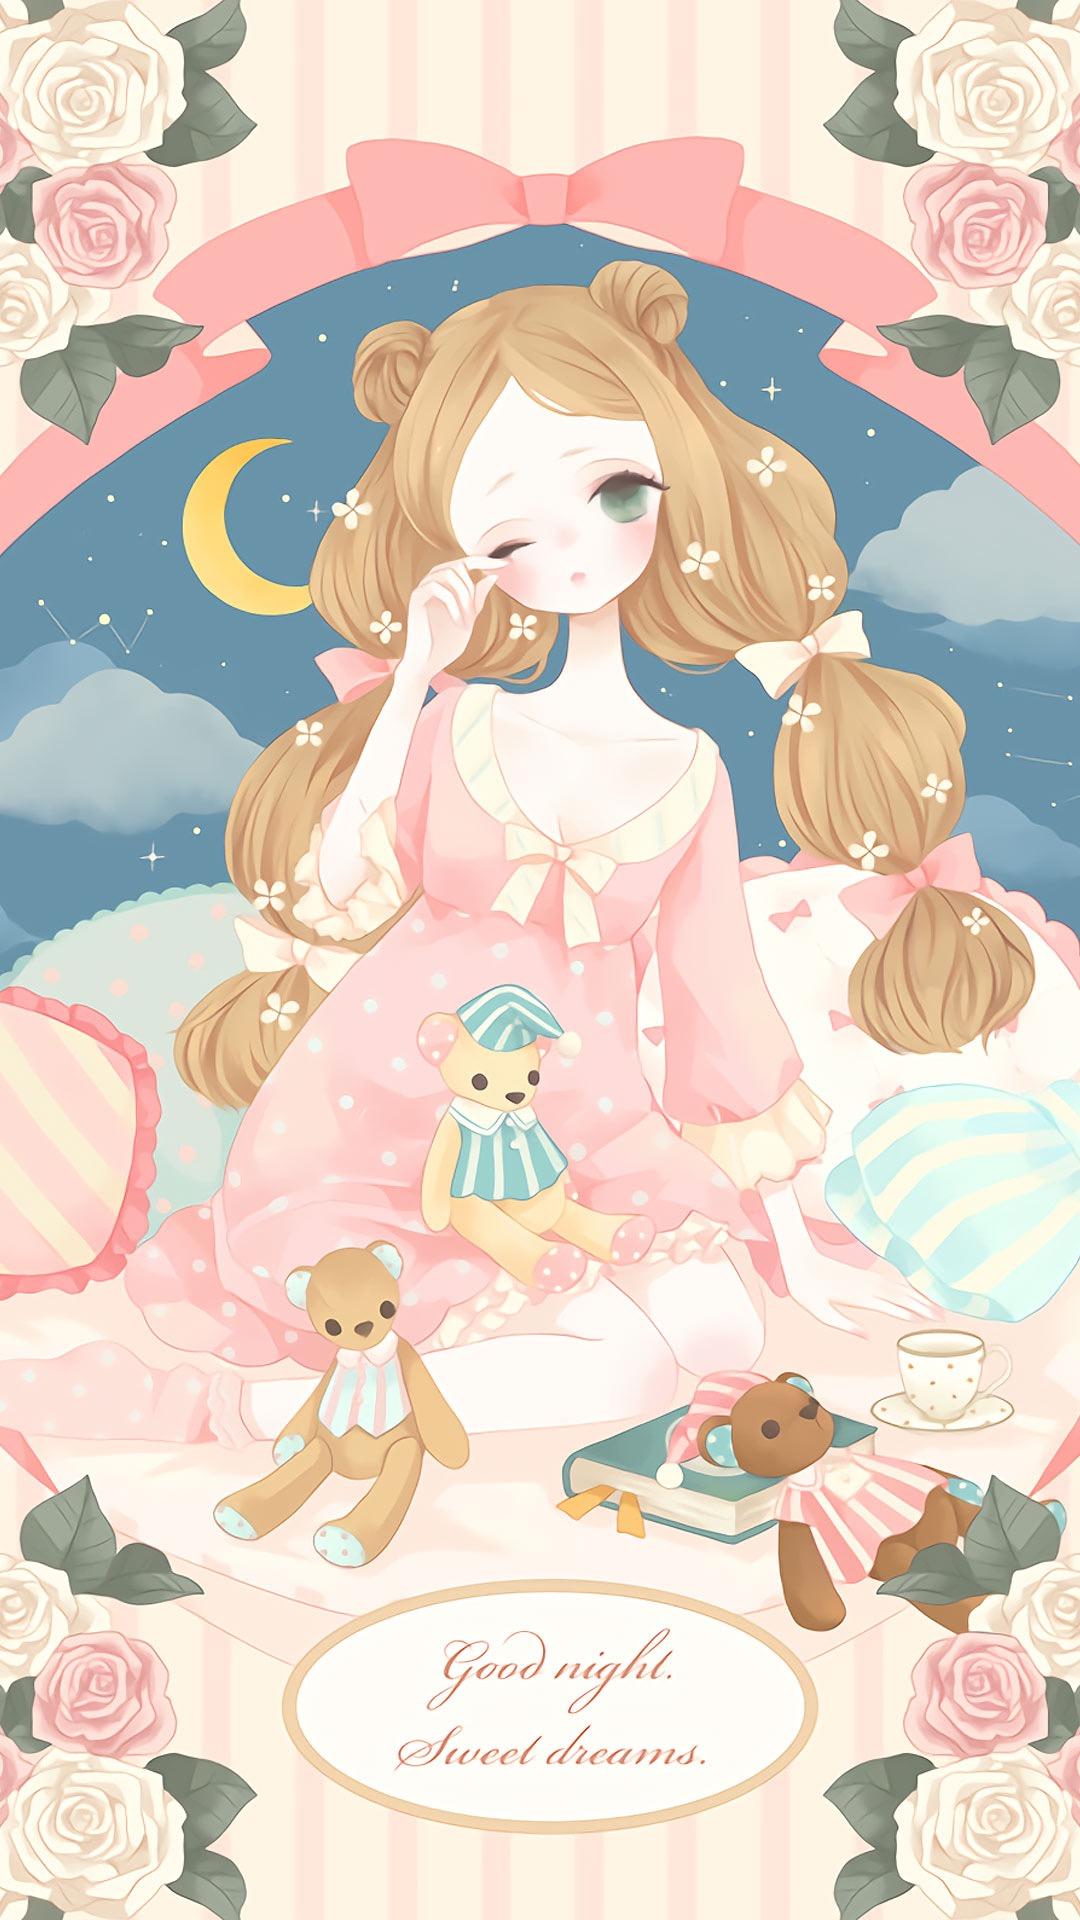 【v粉壁纸】可爱动漫美少女公主